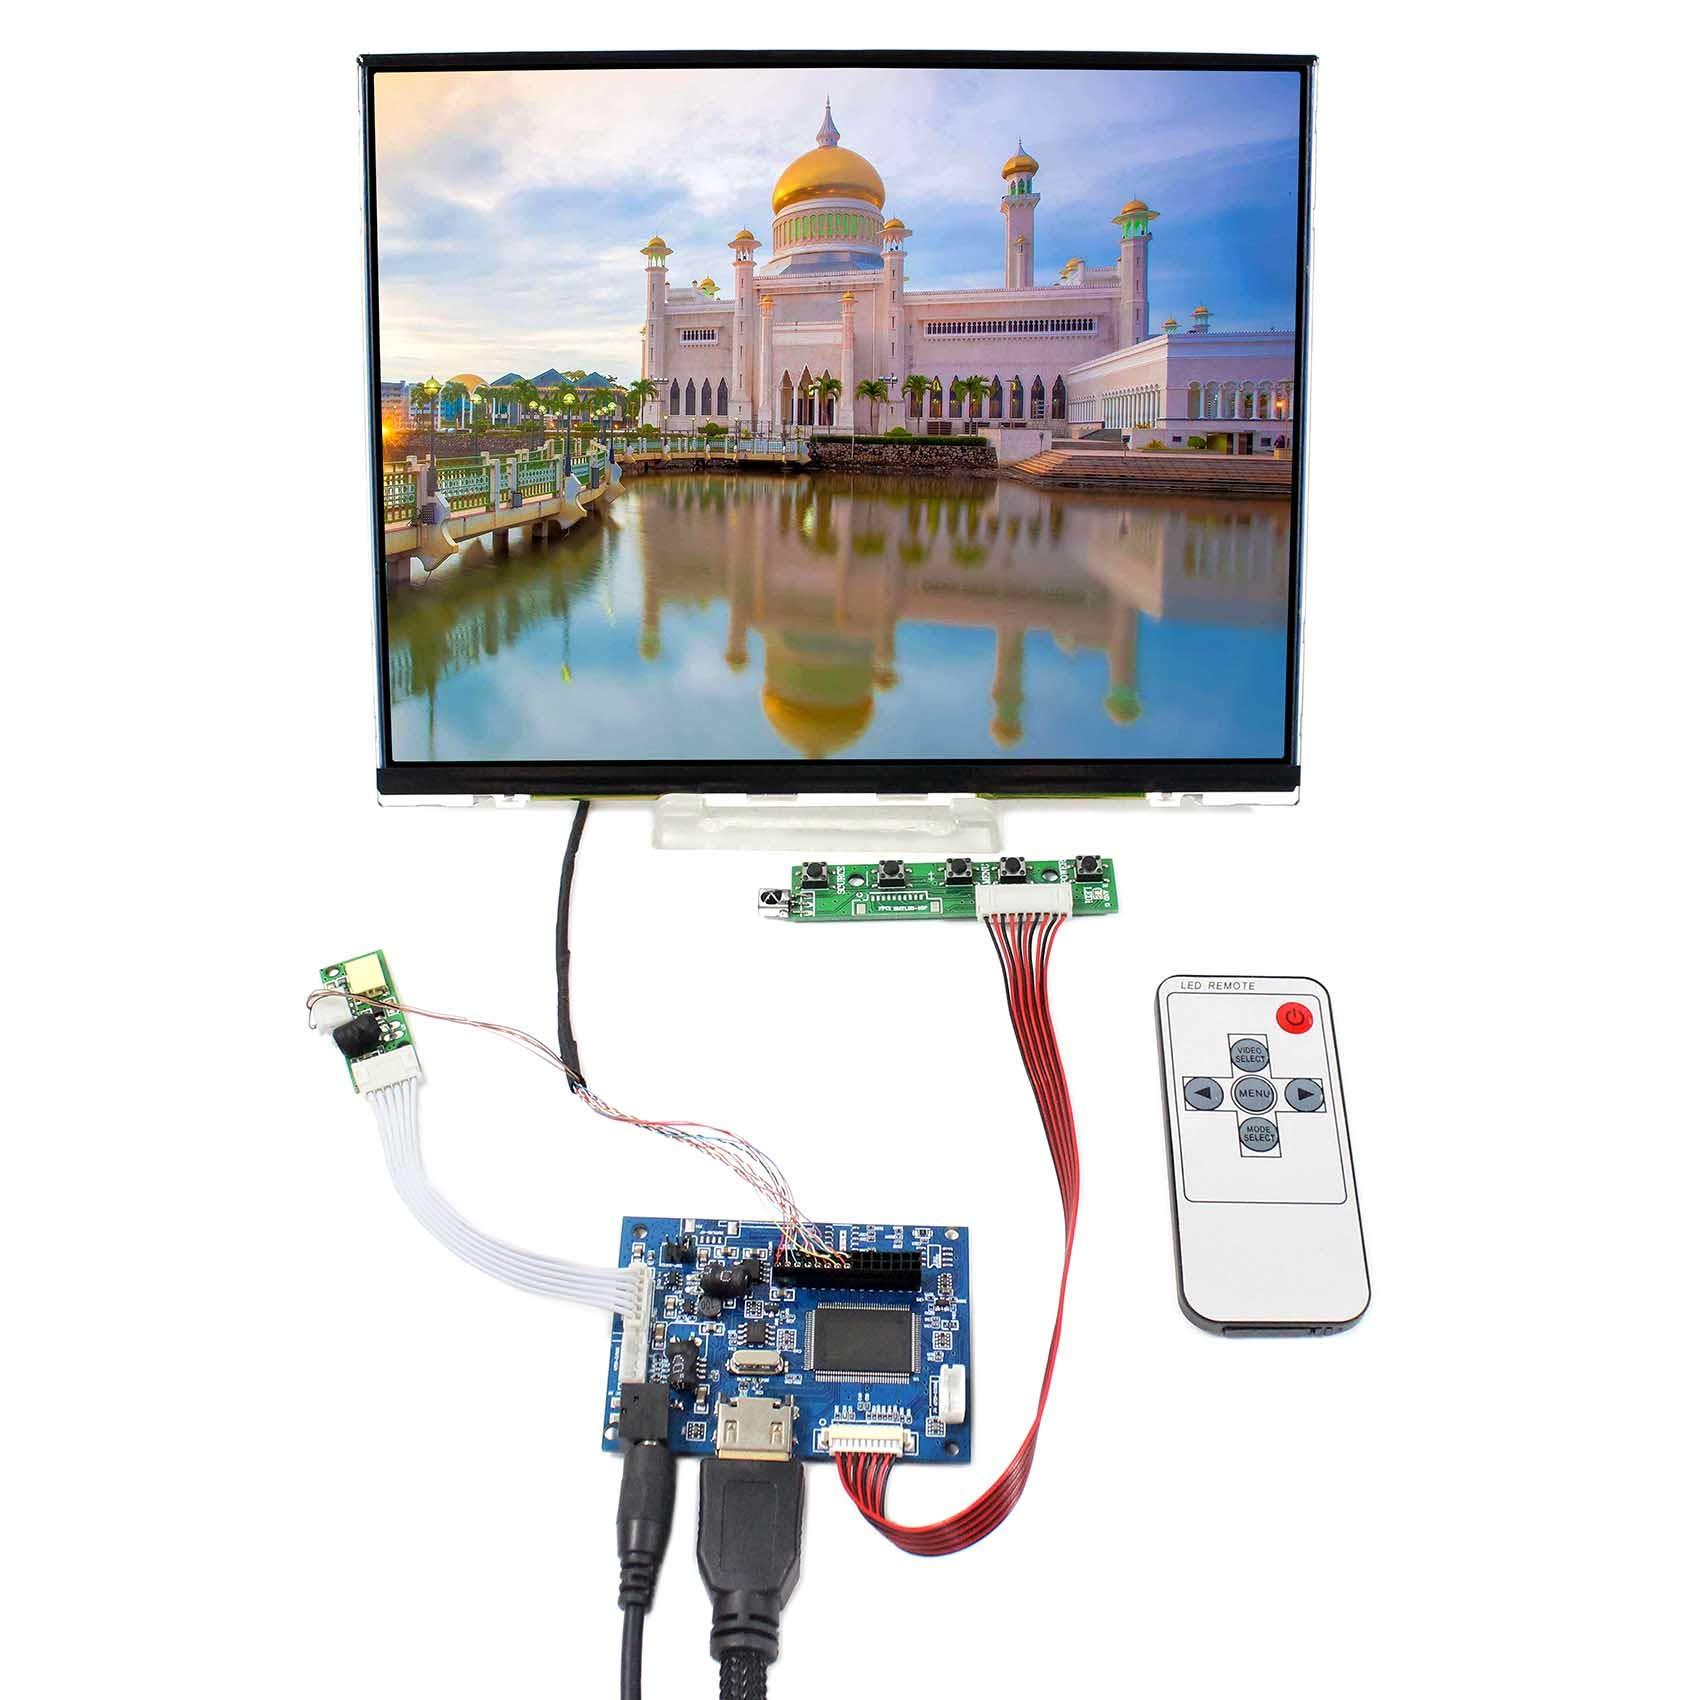 Controladora LCD HDMI VGA 10.4 1024x768 LTD104EDZS